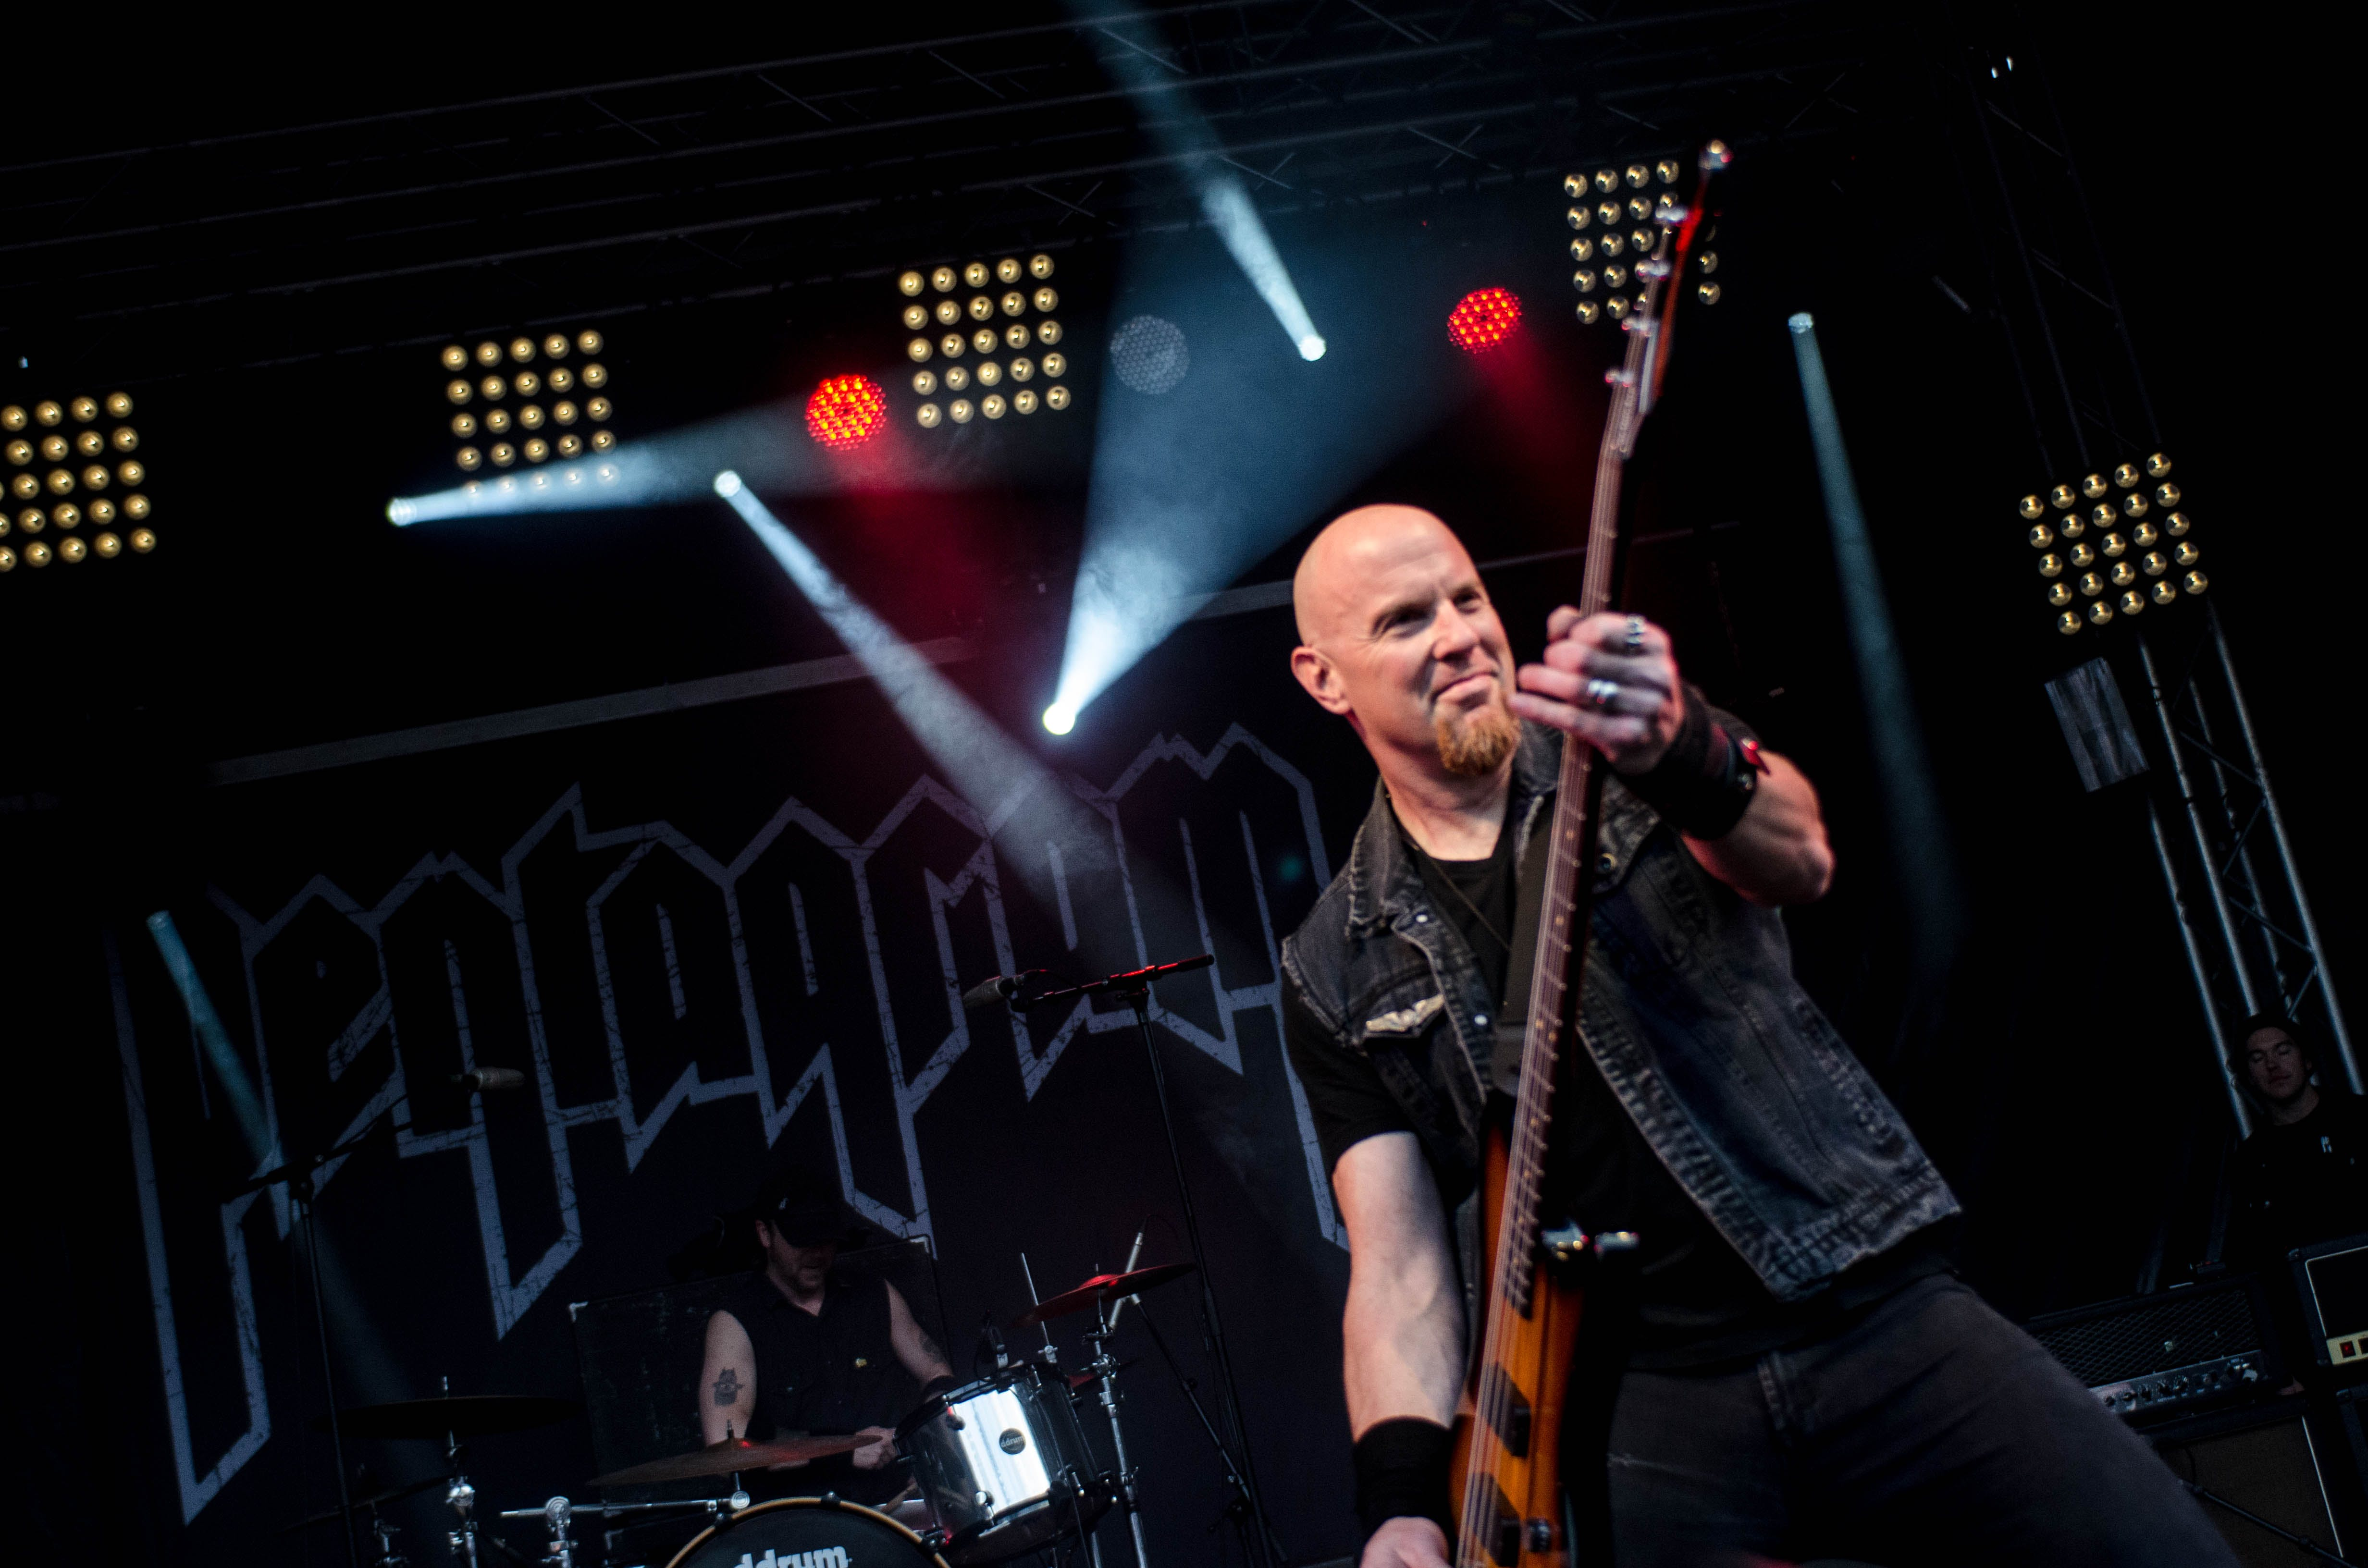 Free stock photo of Pentagram - Durbuy Rock Festival 2016